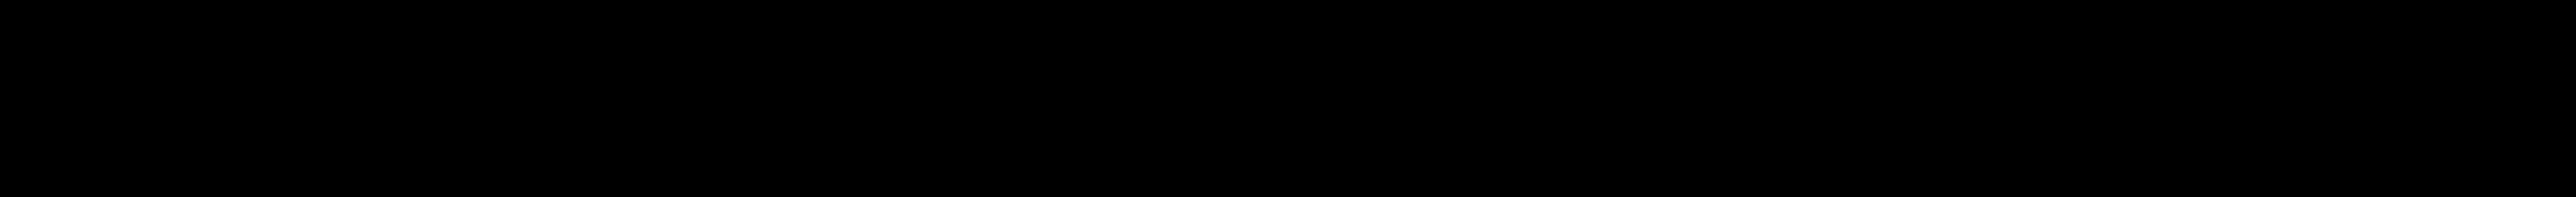 Polhammargruppen